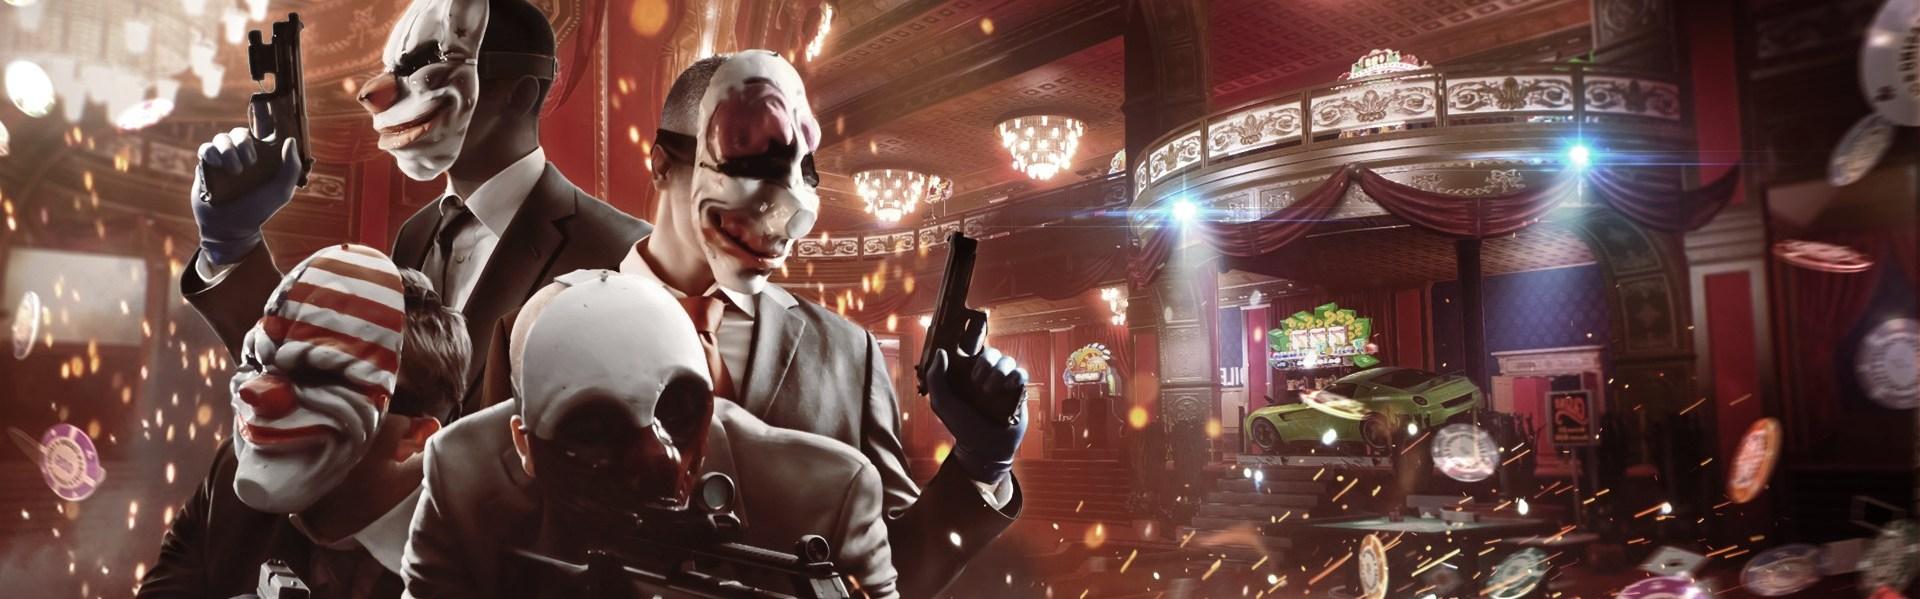 PAYDAY 2 - The Golden Grin Casino Heist (DLC) Steam Key GLOBAL